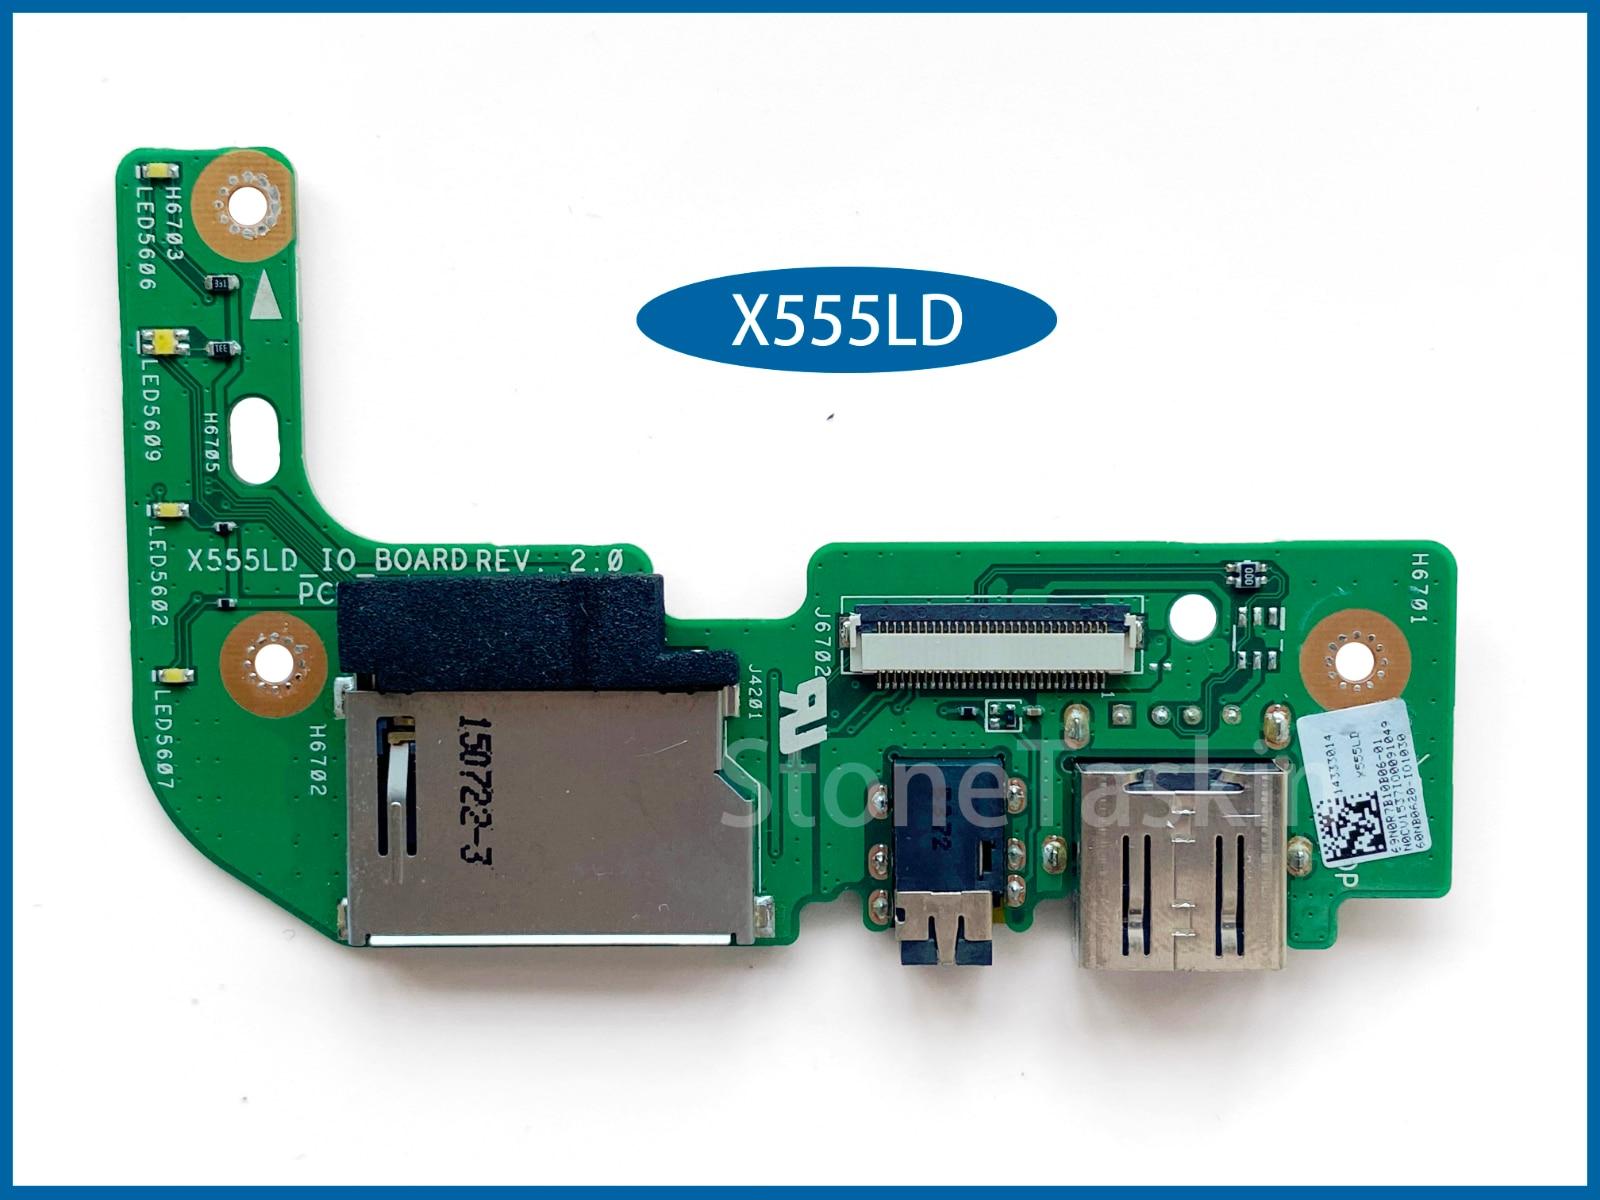 Оригинальная плата для ноутбука ASUS X555LD X555L X555LA K555L A555 F555L, USB-карта X555LD, IO-плата REV2.0 100%, протестирована